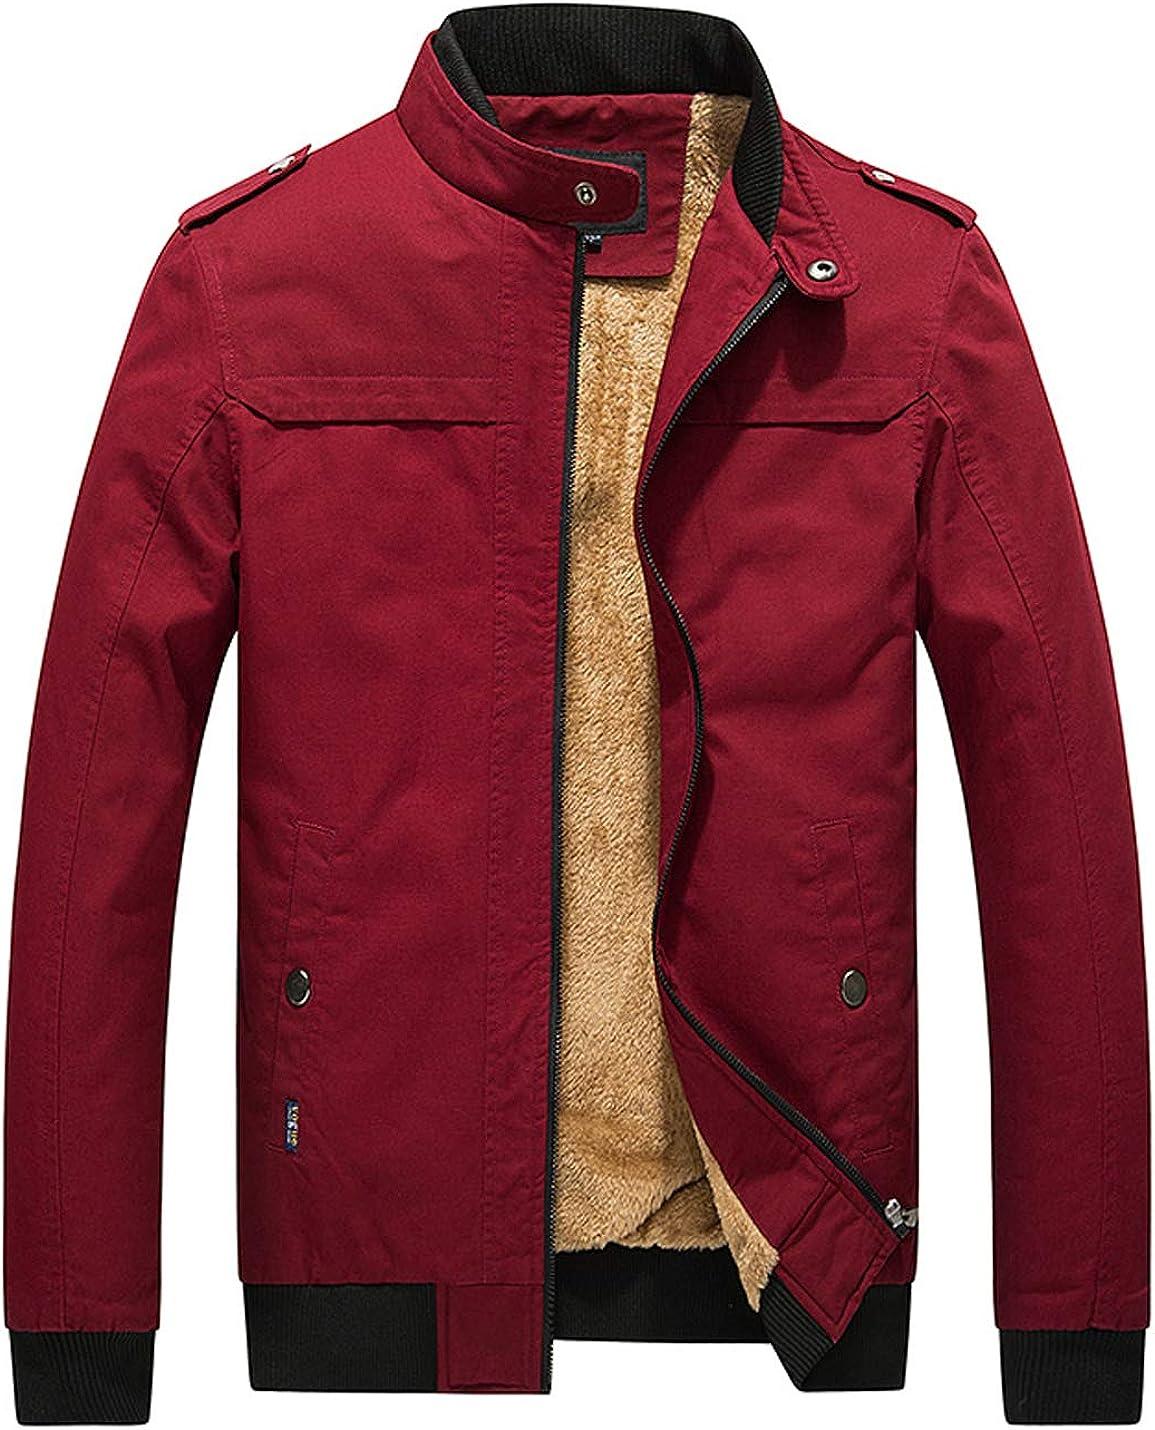 Max 64% OFF D.B.M Popular standard Men's Winter Plus Velvet Windbrea Collar Cotton Thickening